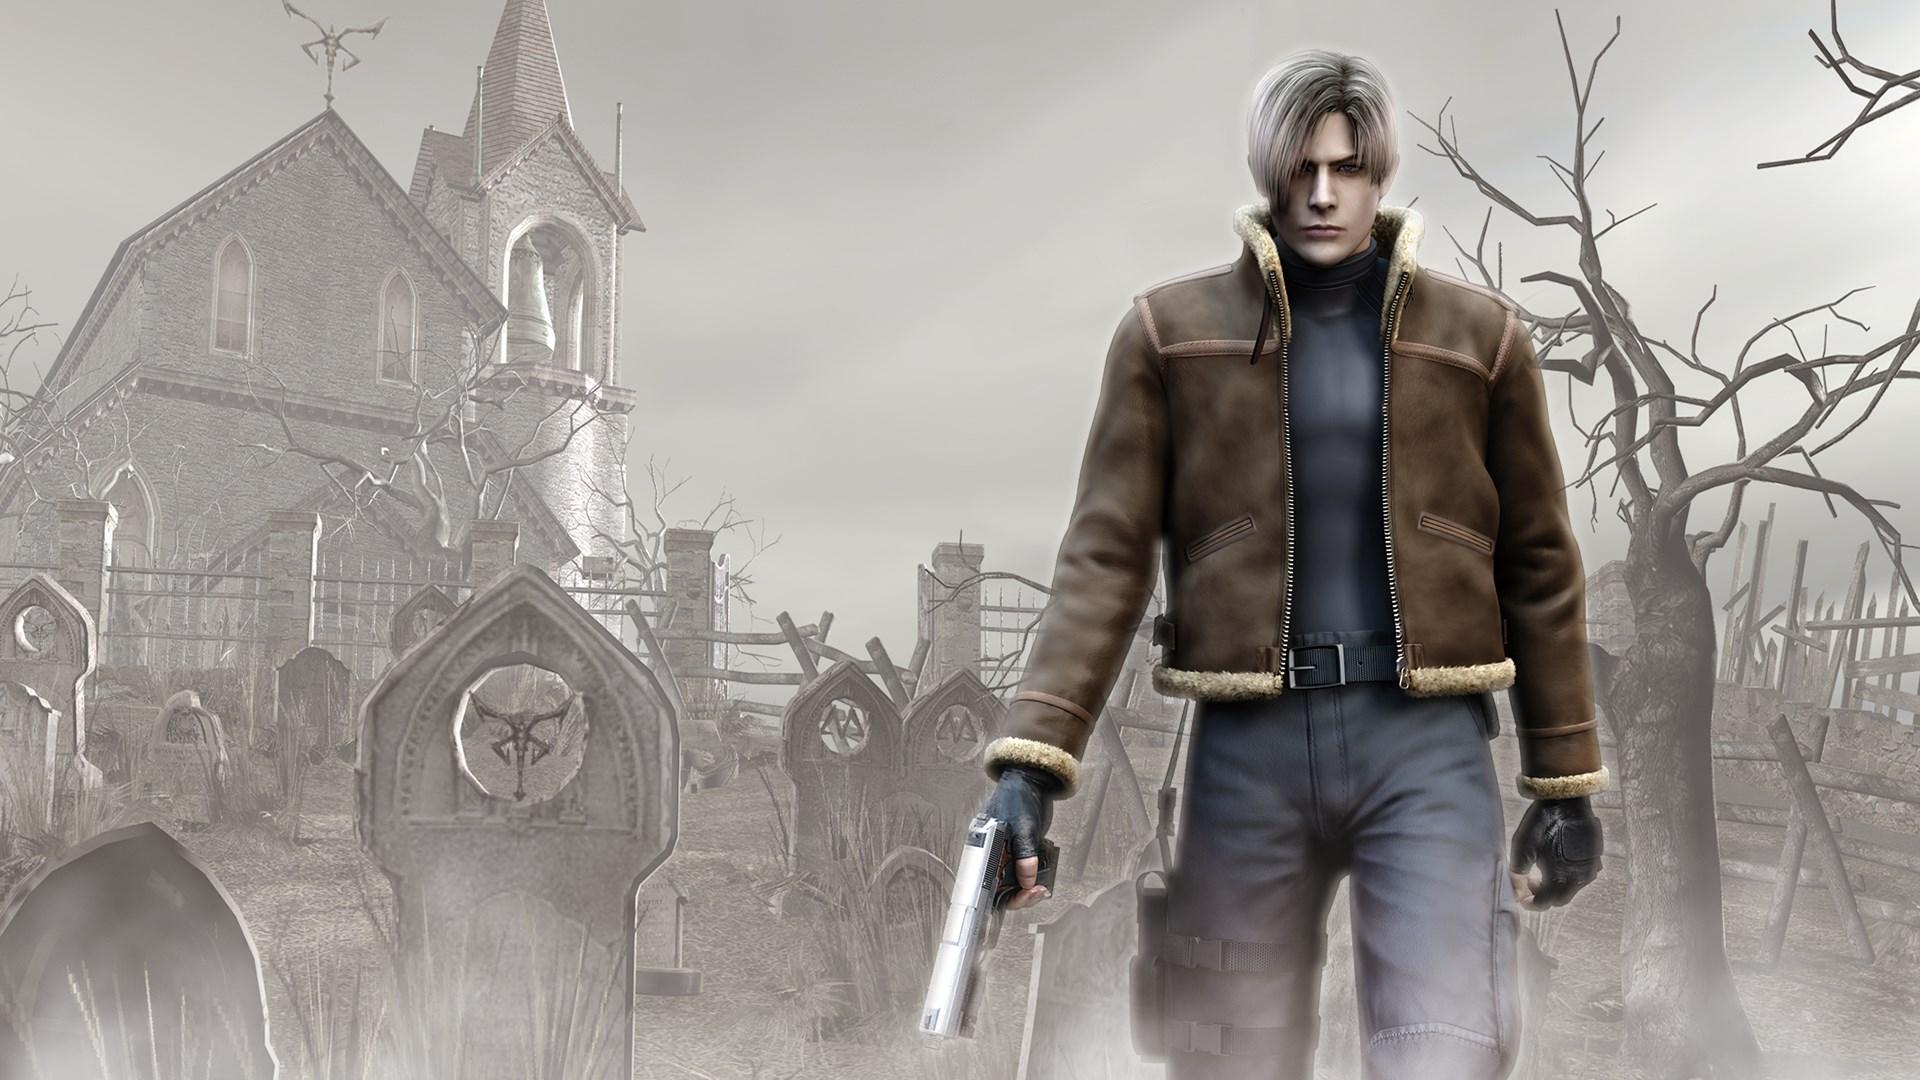 7 Game PS2 Terbaik Menurut Ane yang Bikin Nostalgia, Kalian Setuju?